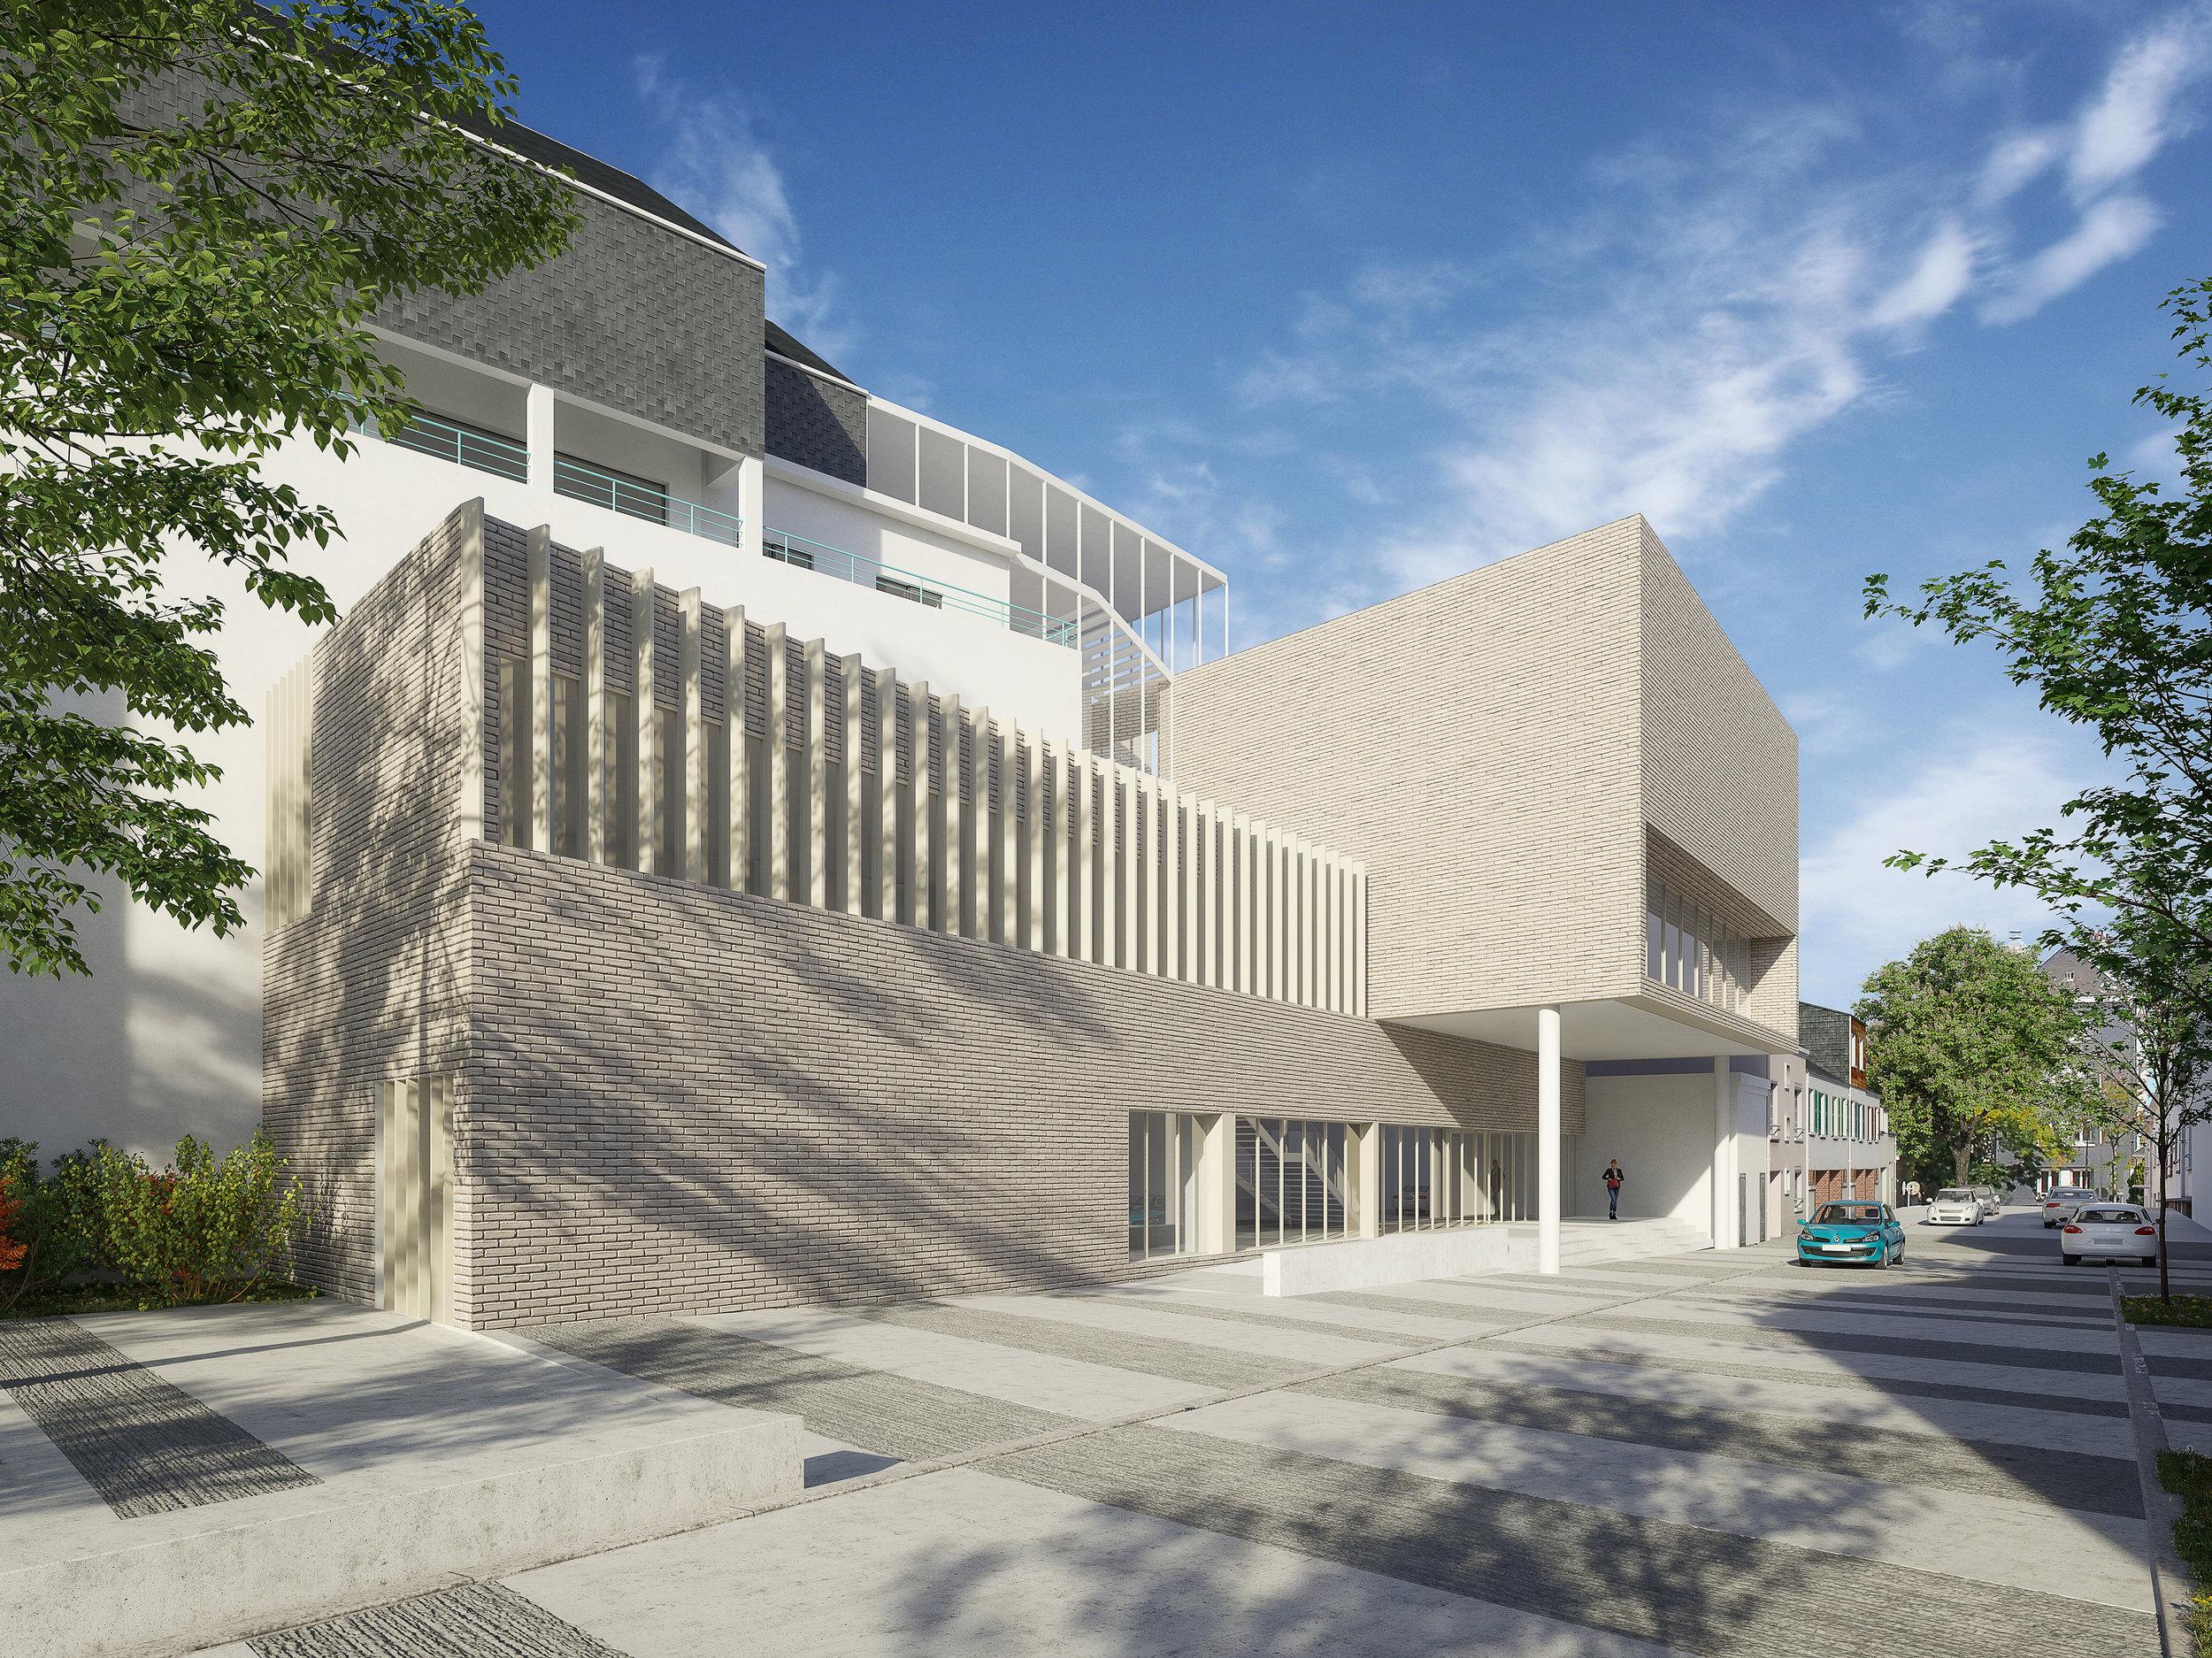 conservatoire_saint_nazaire_public_outdoor_design_christophe_gautrand_paysagiste_3.jpg